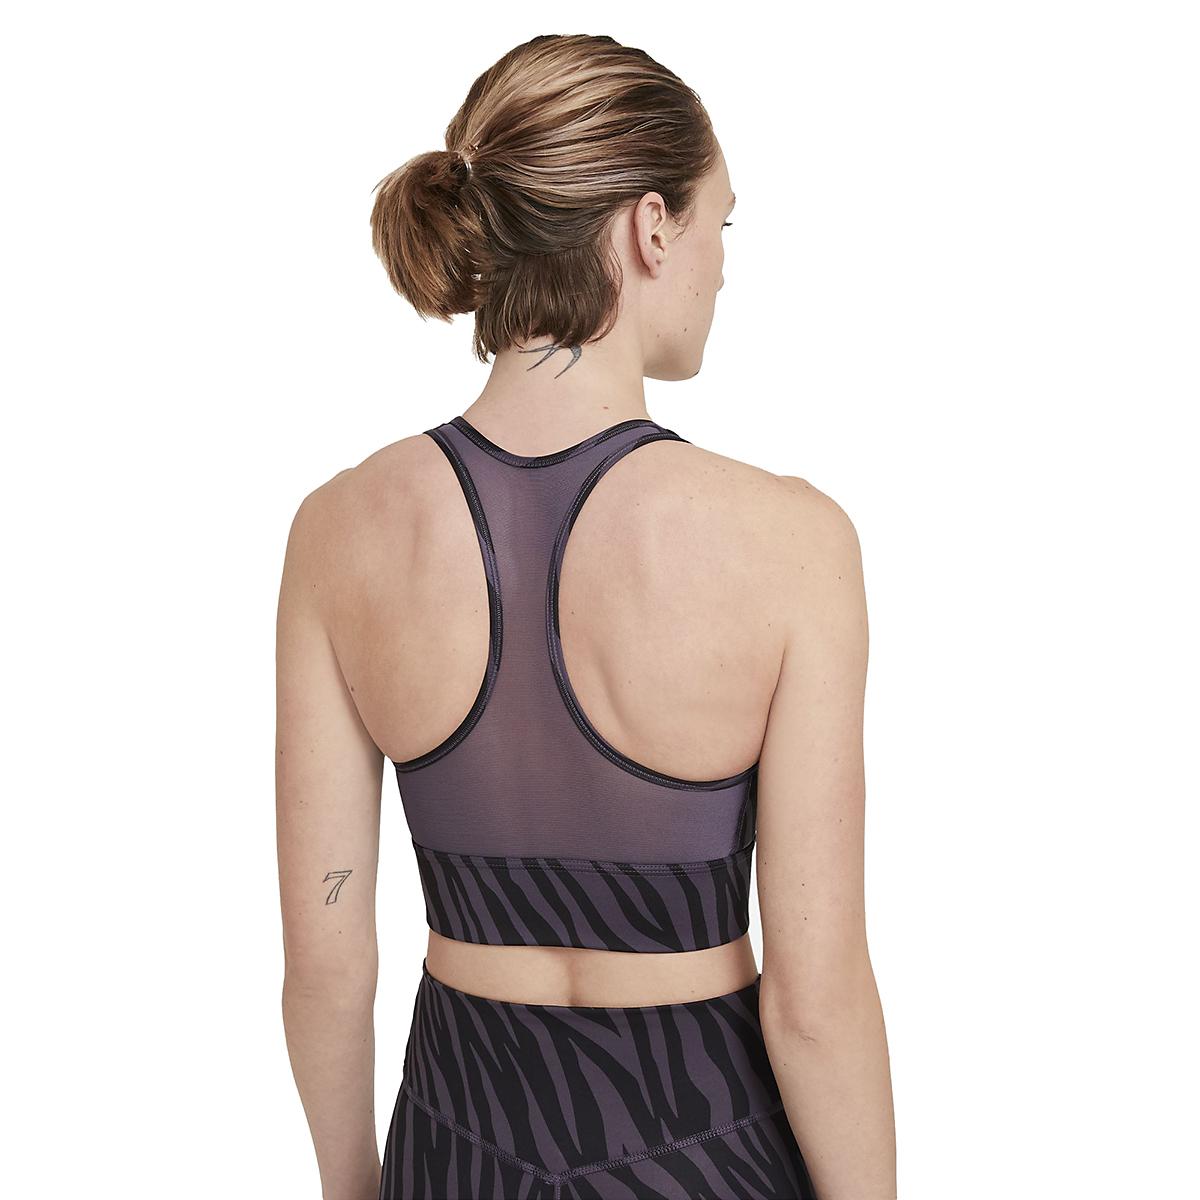 Women's Nike Dri-FIT Swoosh Icon Clash Bra - Color: Dark Raisin/White - Size: XS, Dark Raisin/White, large, image 3